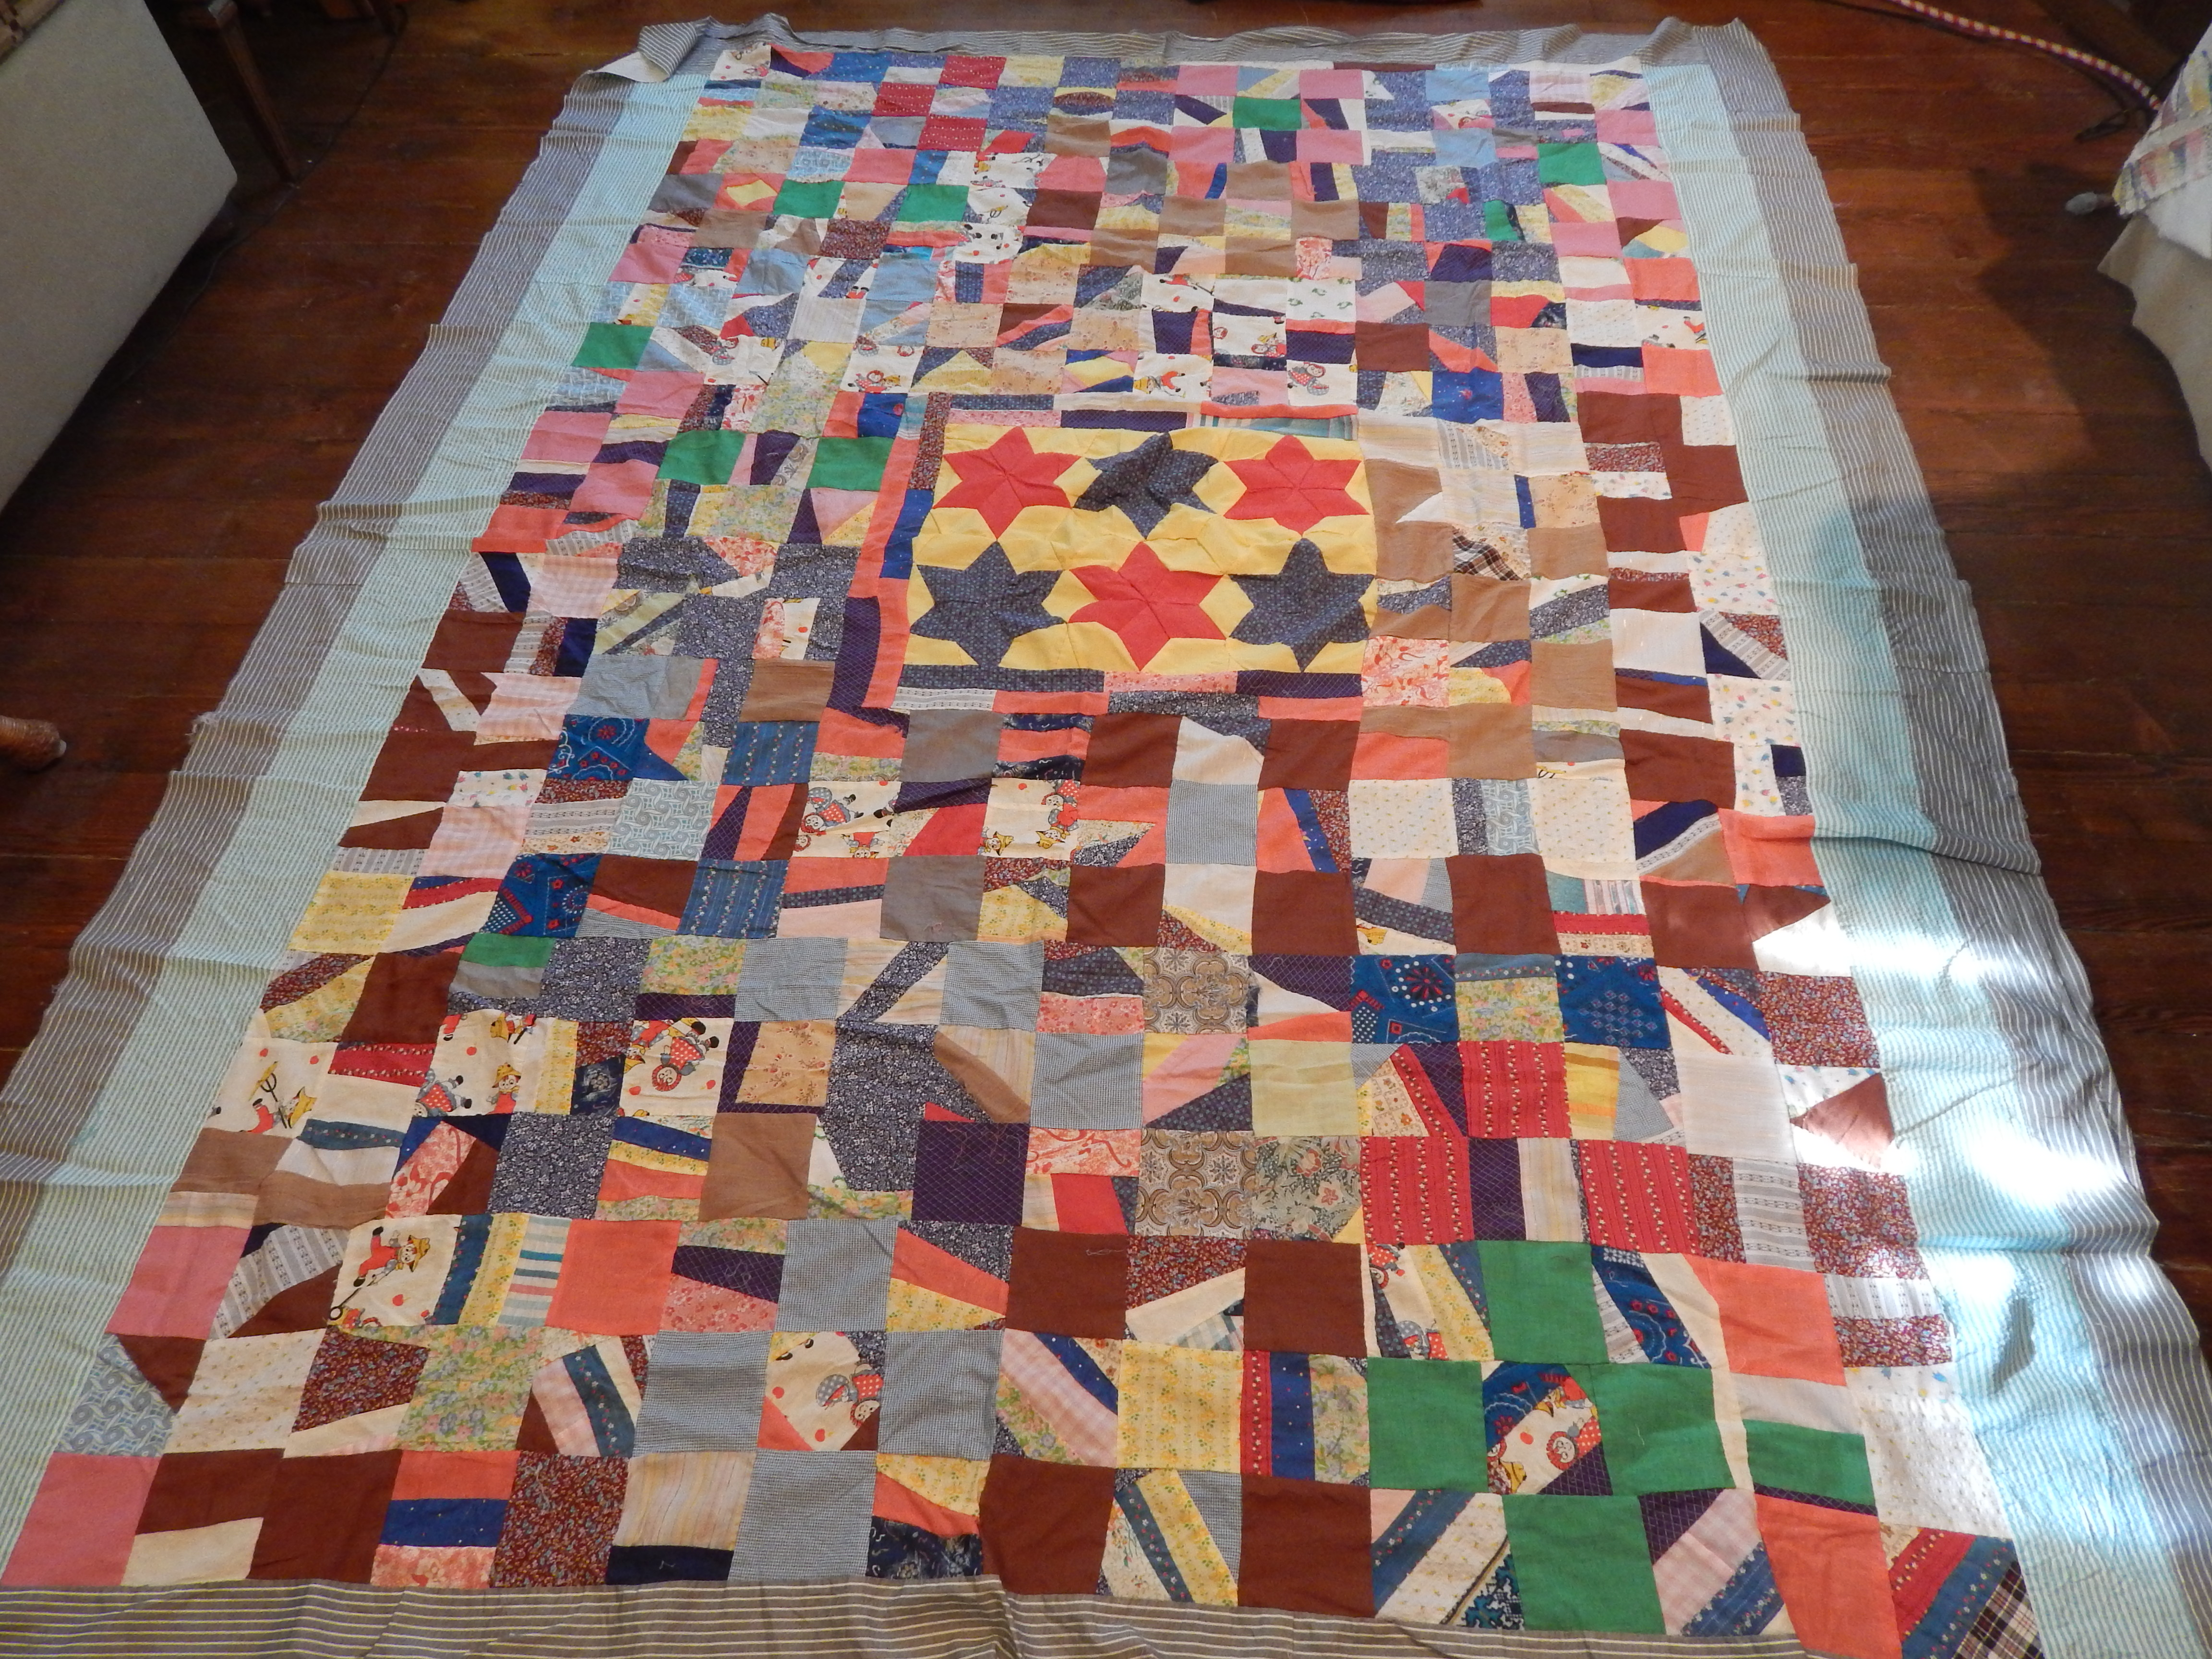 Vintage Quilt Tops | Tim Latimer - Quilts etc : vintage quilt tops - Adamdwight.com